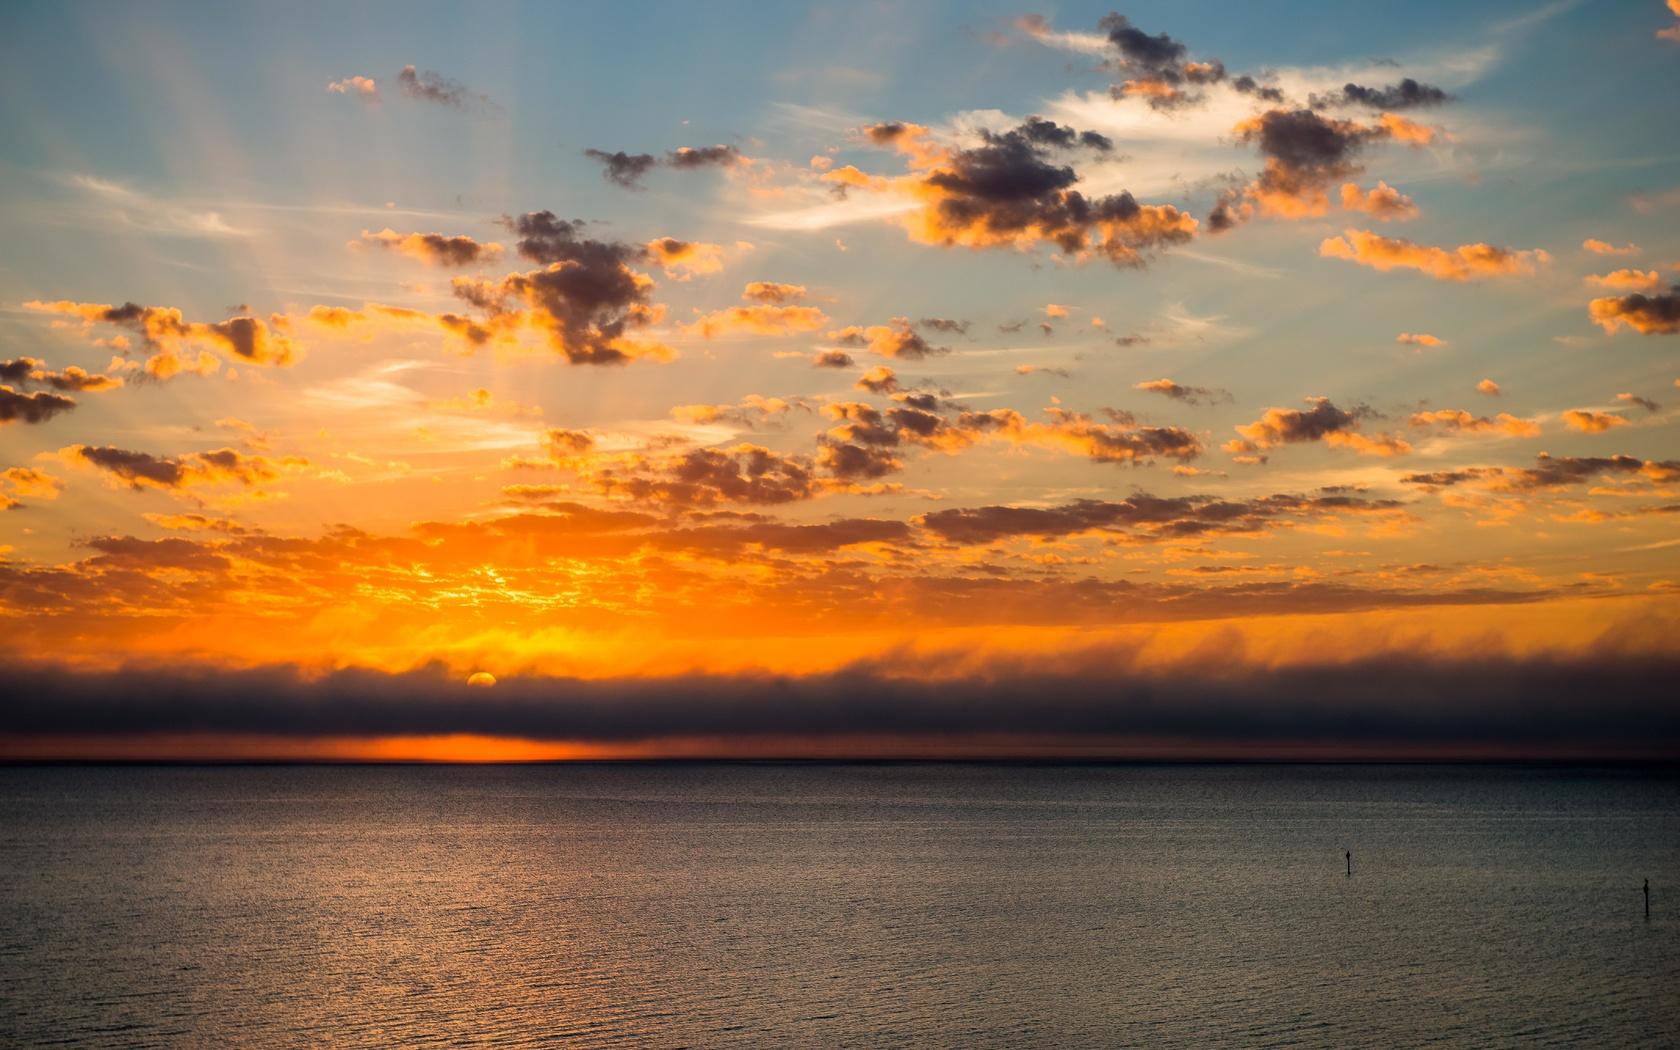 закат, горизонт, солнце, море, облака